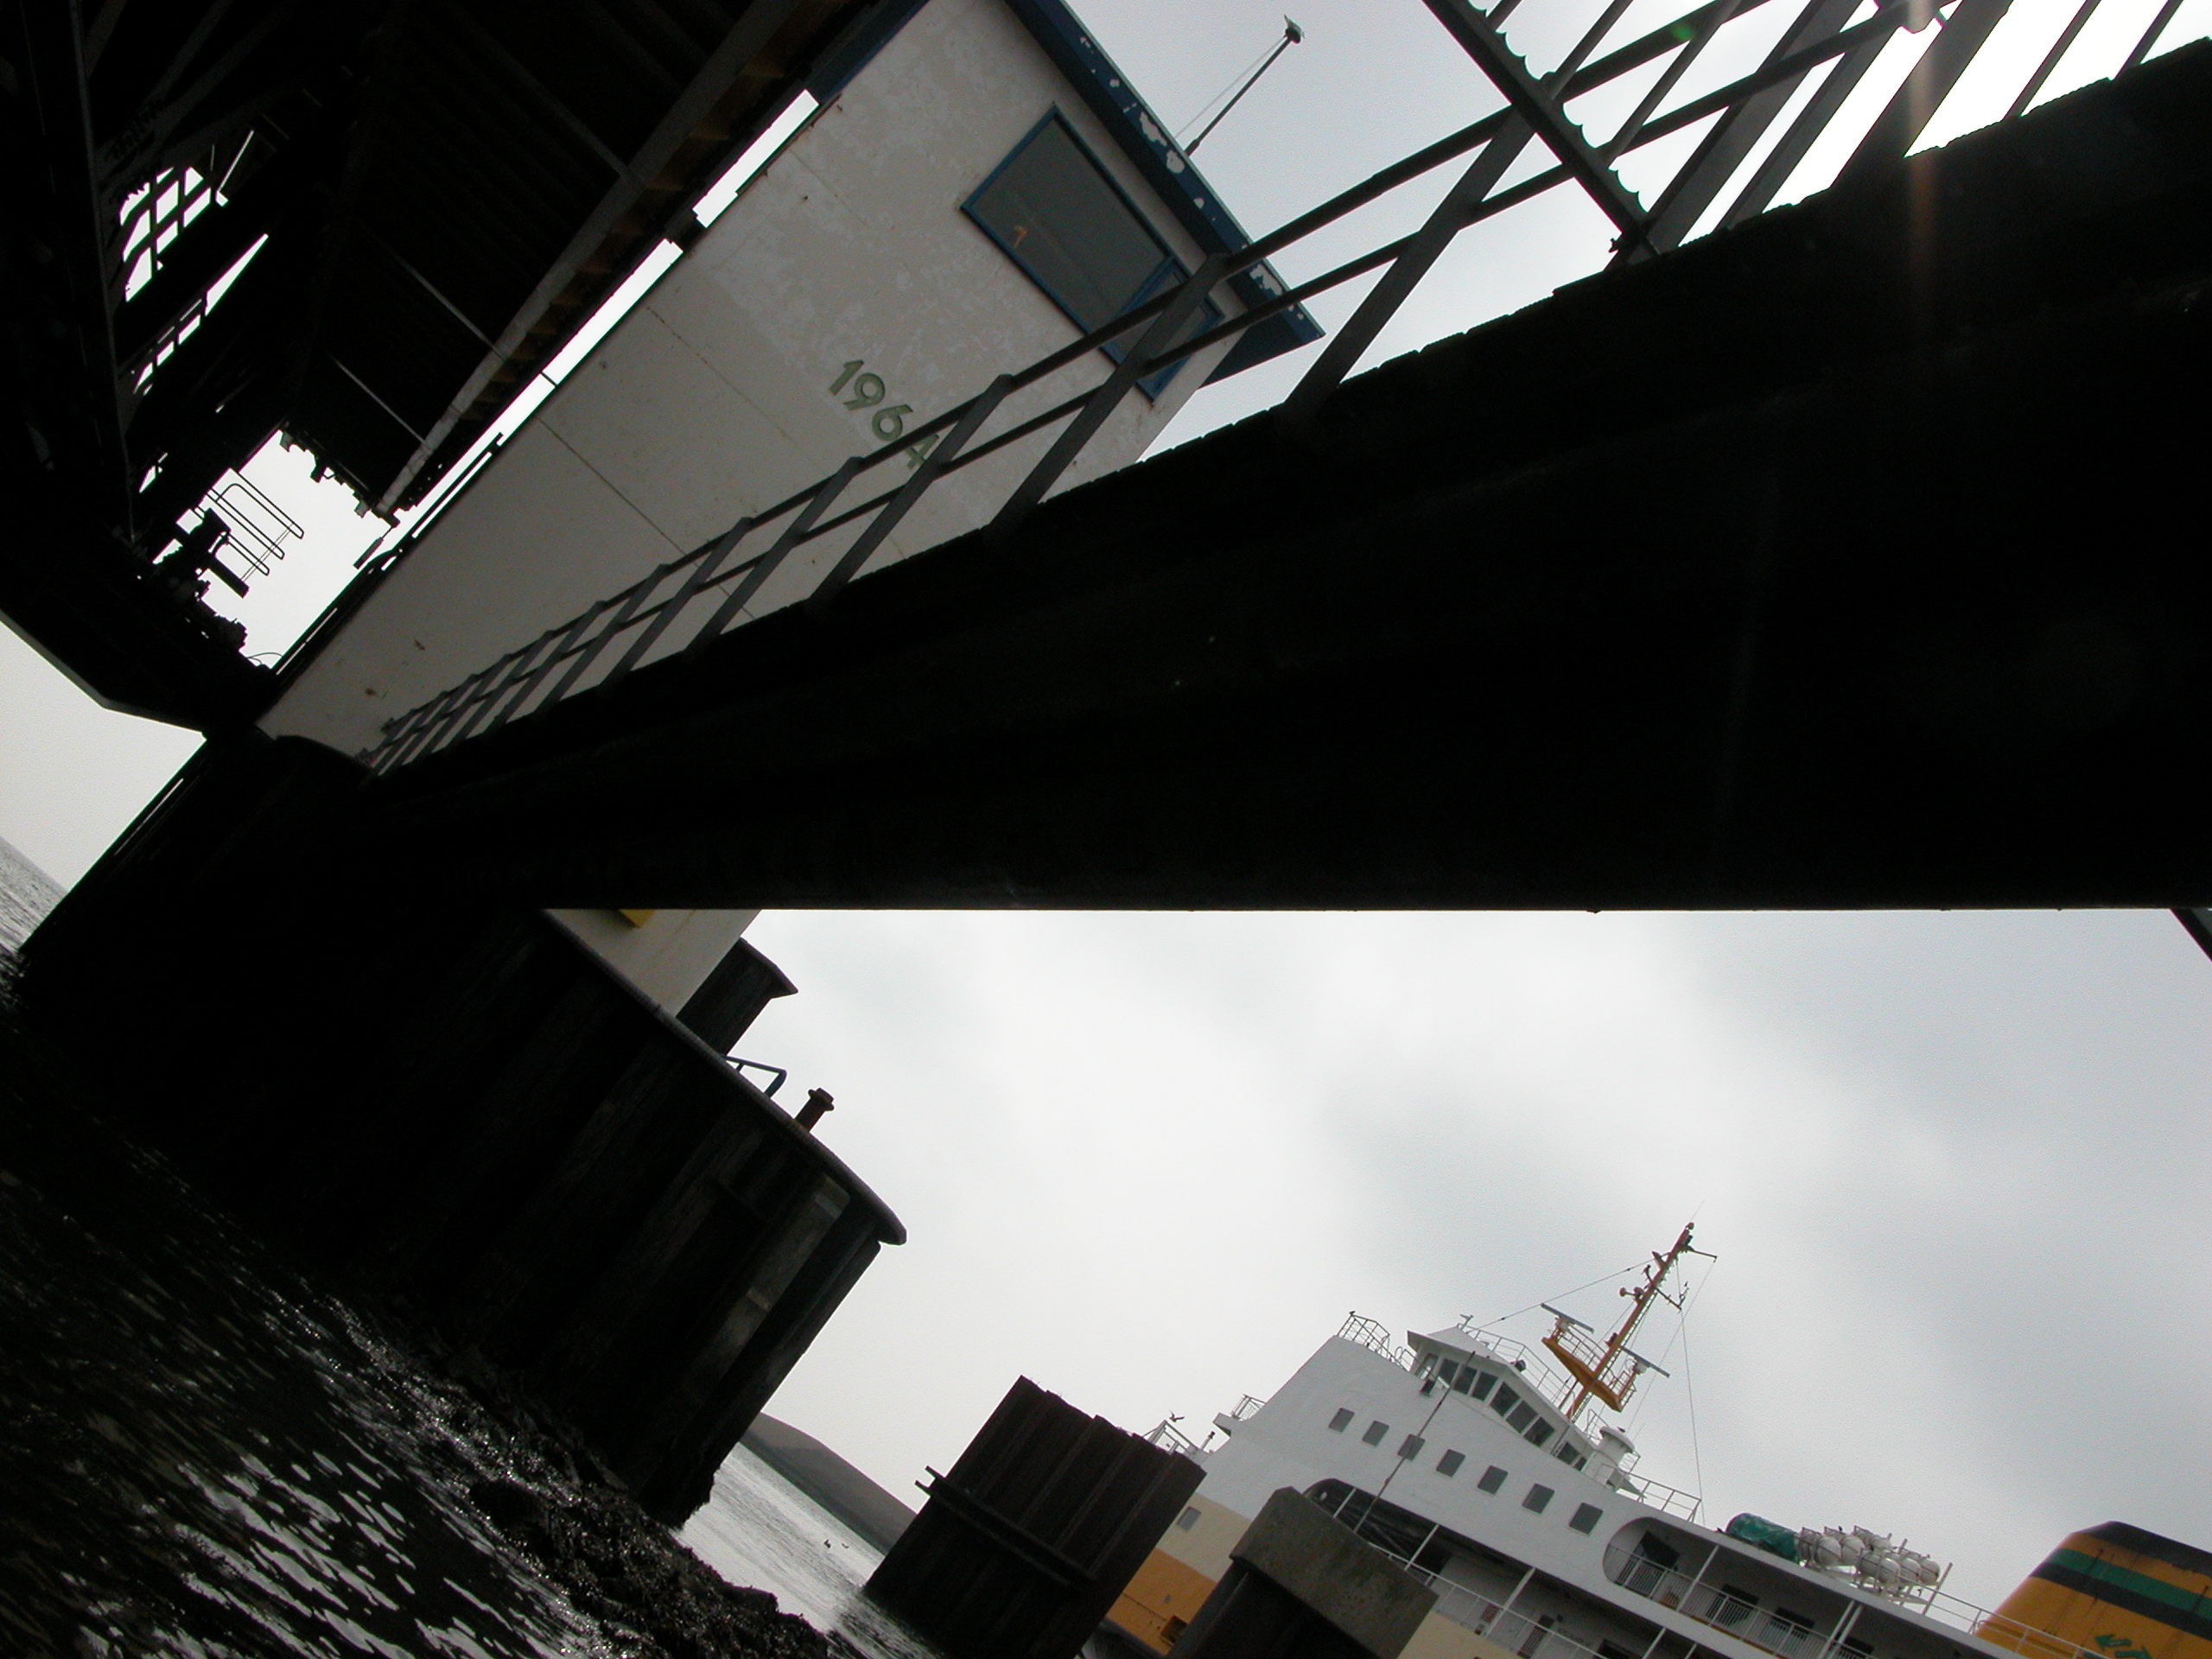 bridge ferry gangplank gangway black outline actionshot railing